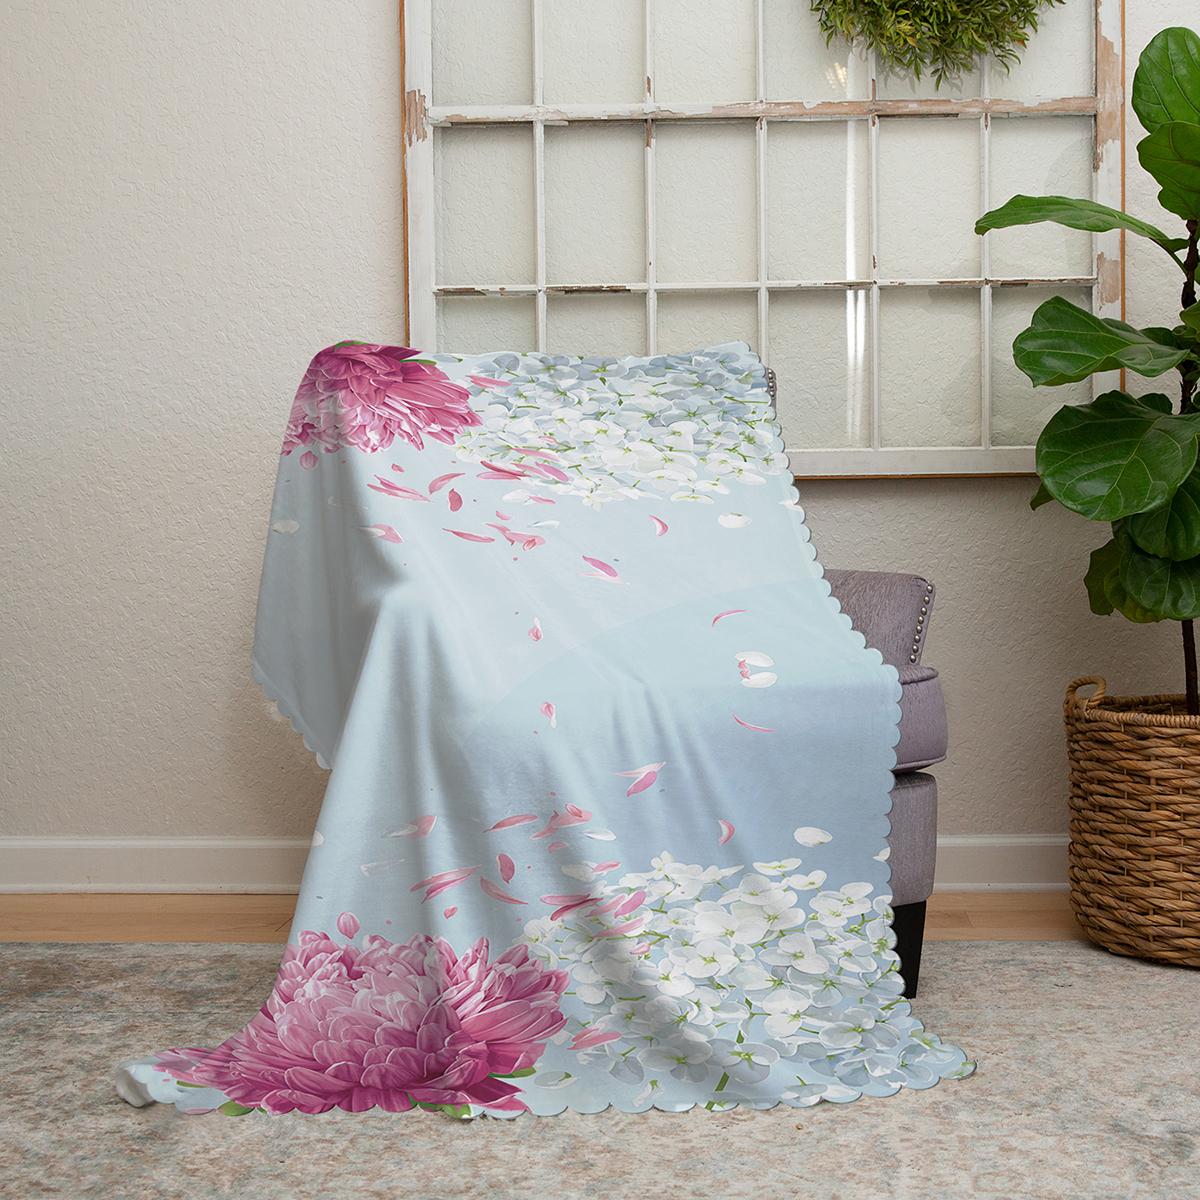 Realhomes Mavi Zeminde Fuşya Beyaz Ortanca Çiçeği Baskılı Şönil Koltuk Şalı Realhomes